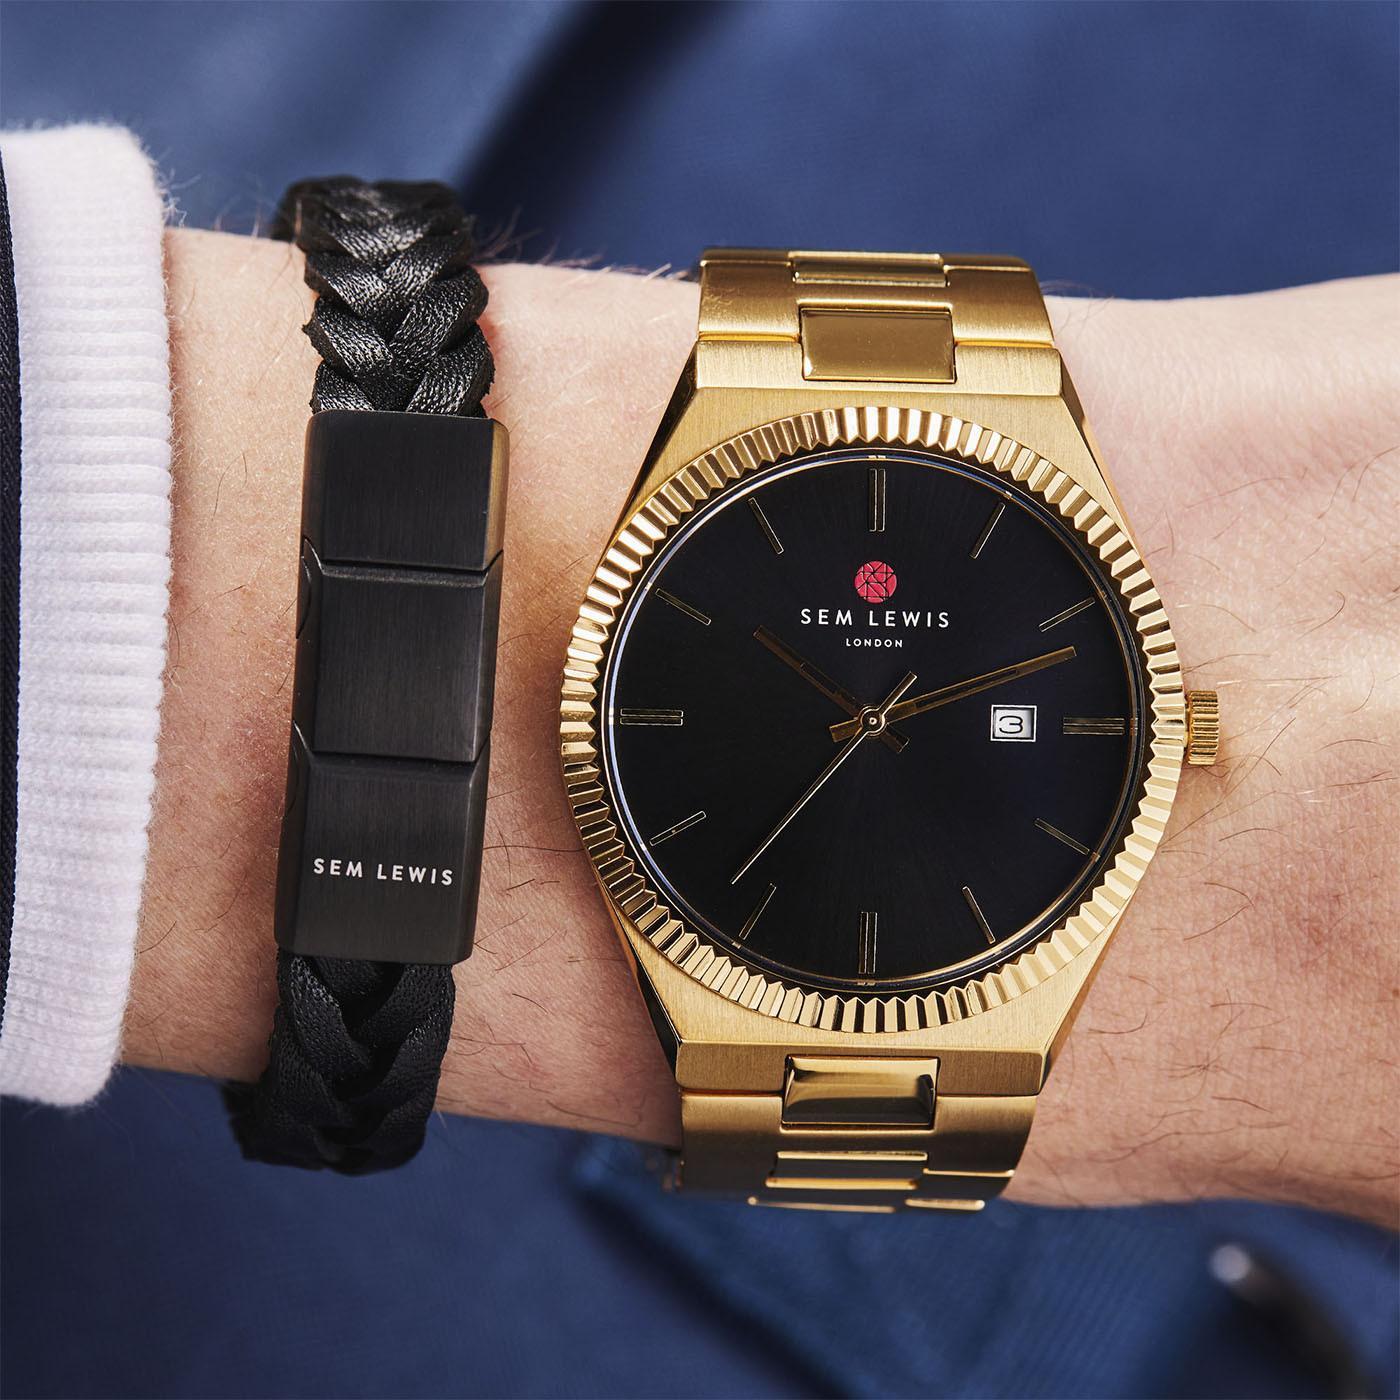 Sem Lewis Bakerloo Paddington Armband SL220032 (Lengte: 19.50-21.00 cm)